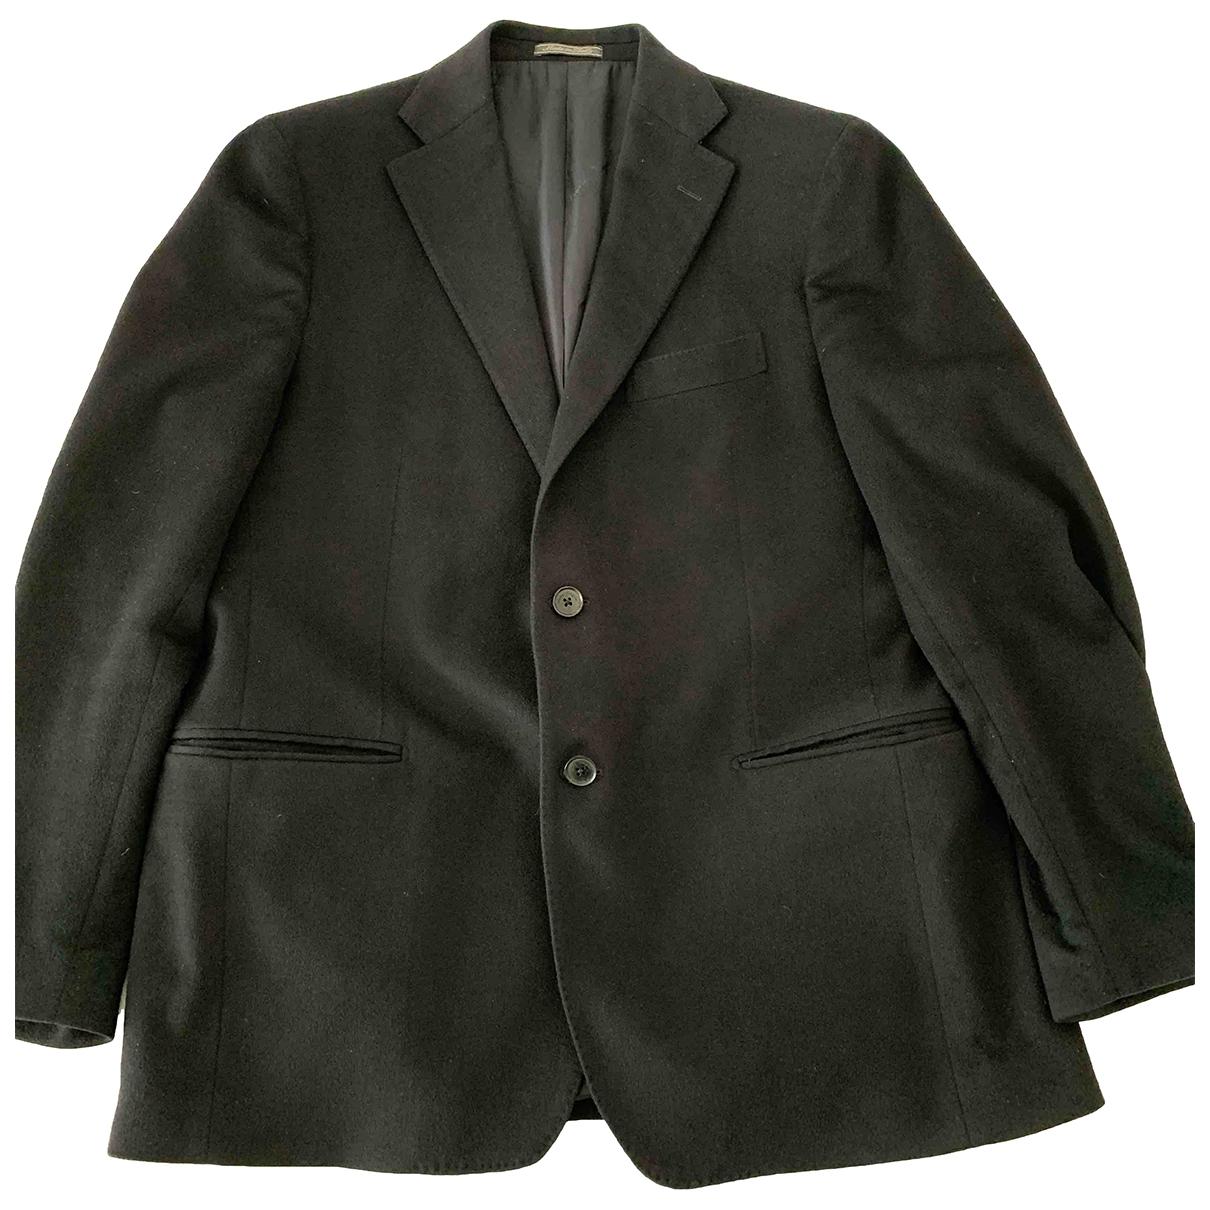 Salvatore Ferragamo \N Black Cashmere jacket  for Men 54 IT